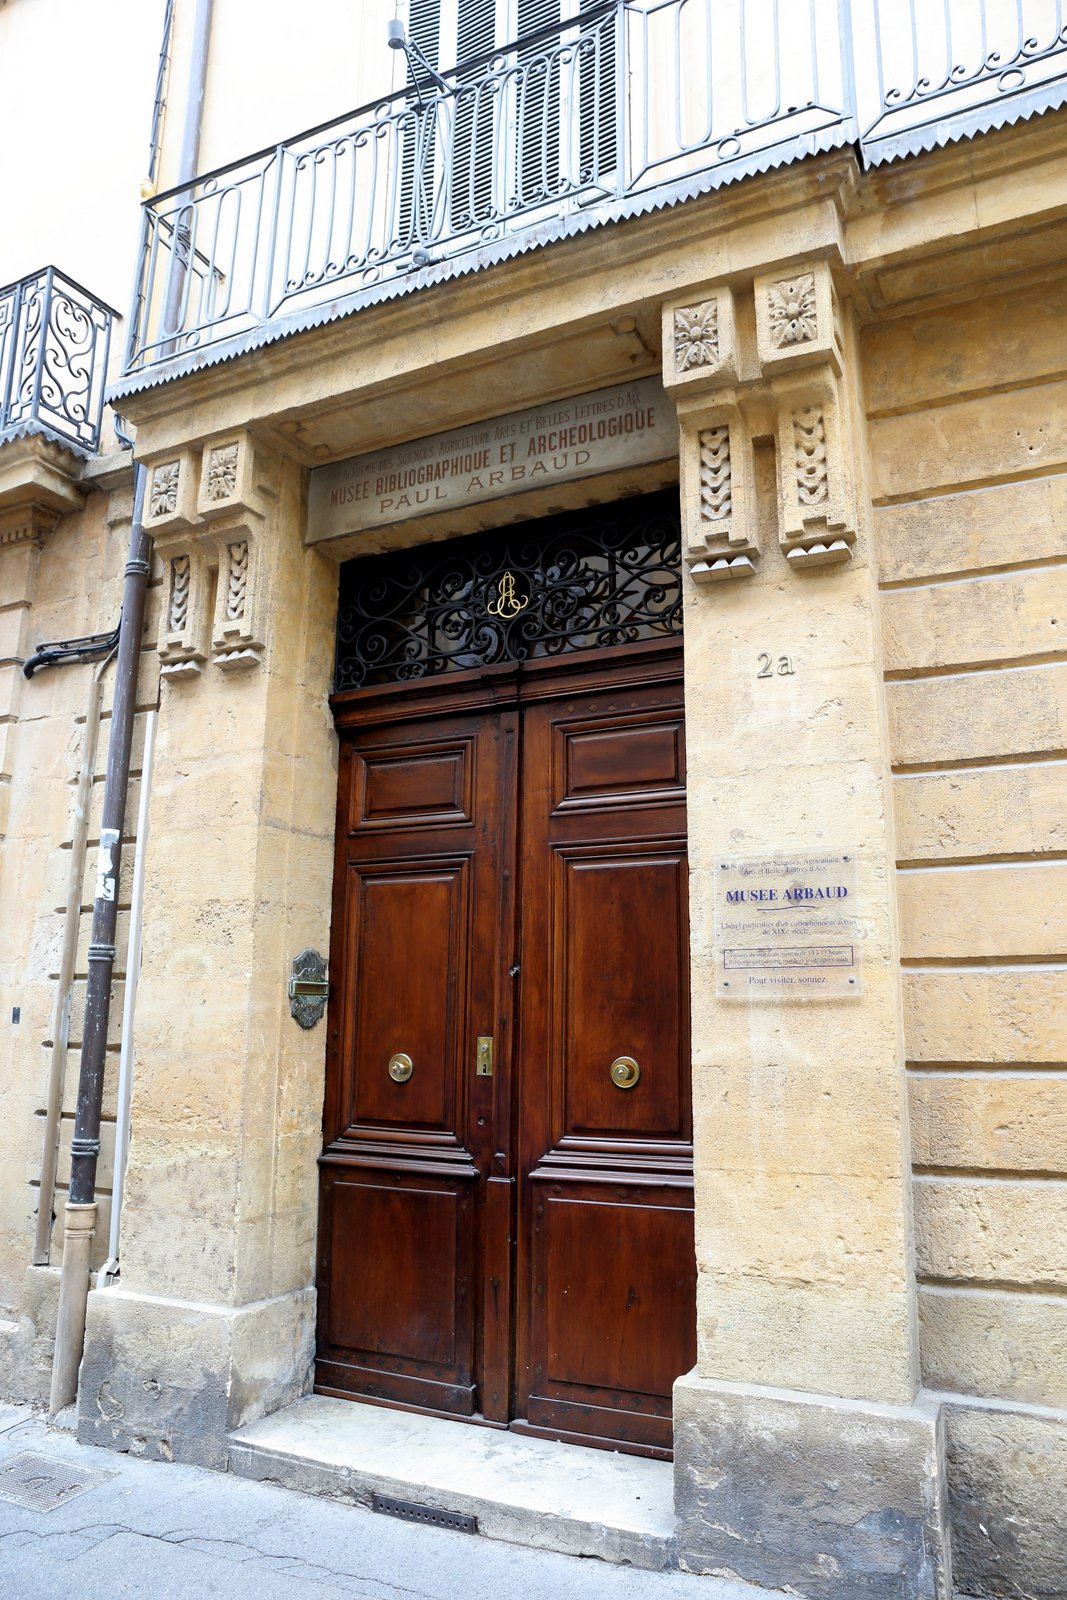 Hôtel Paul d'Arbaud